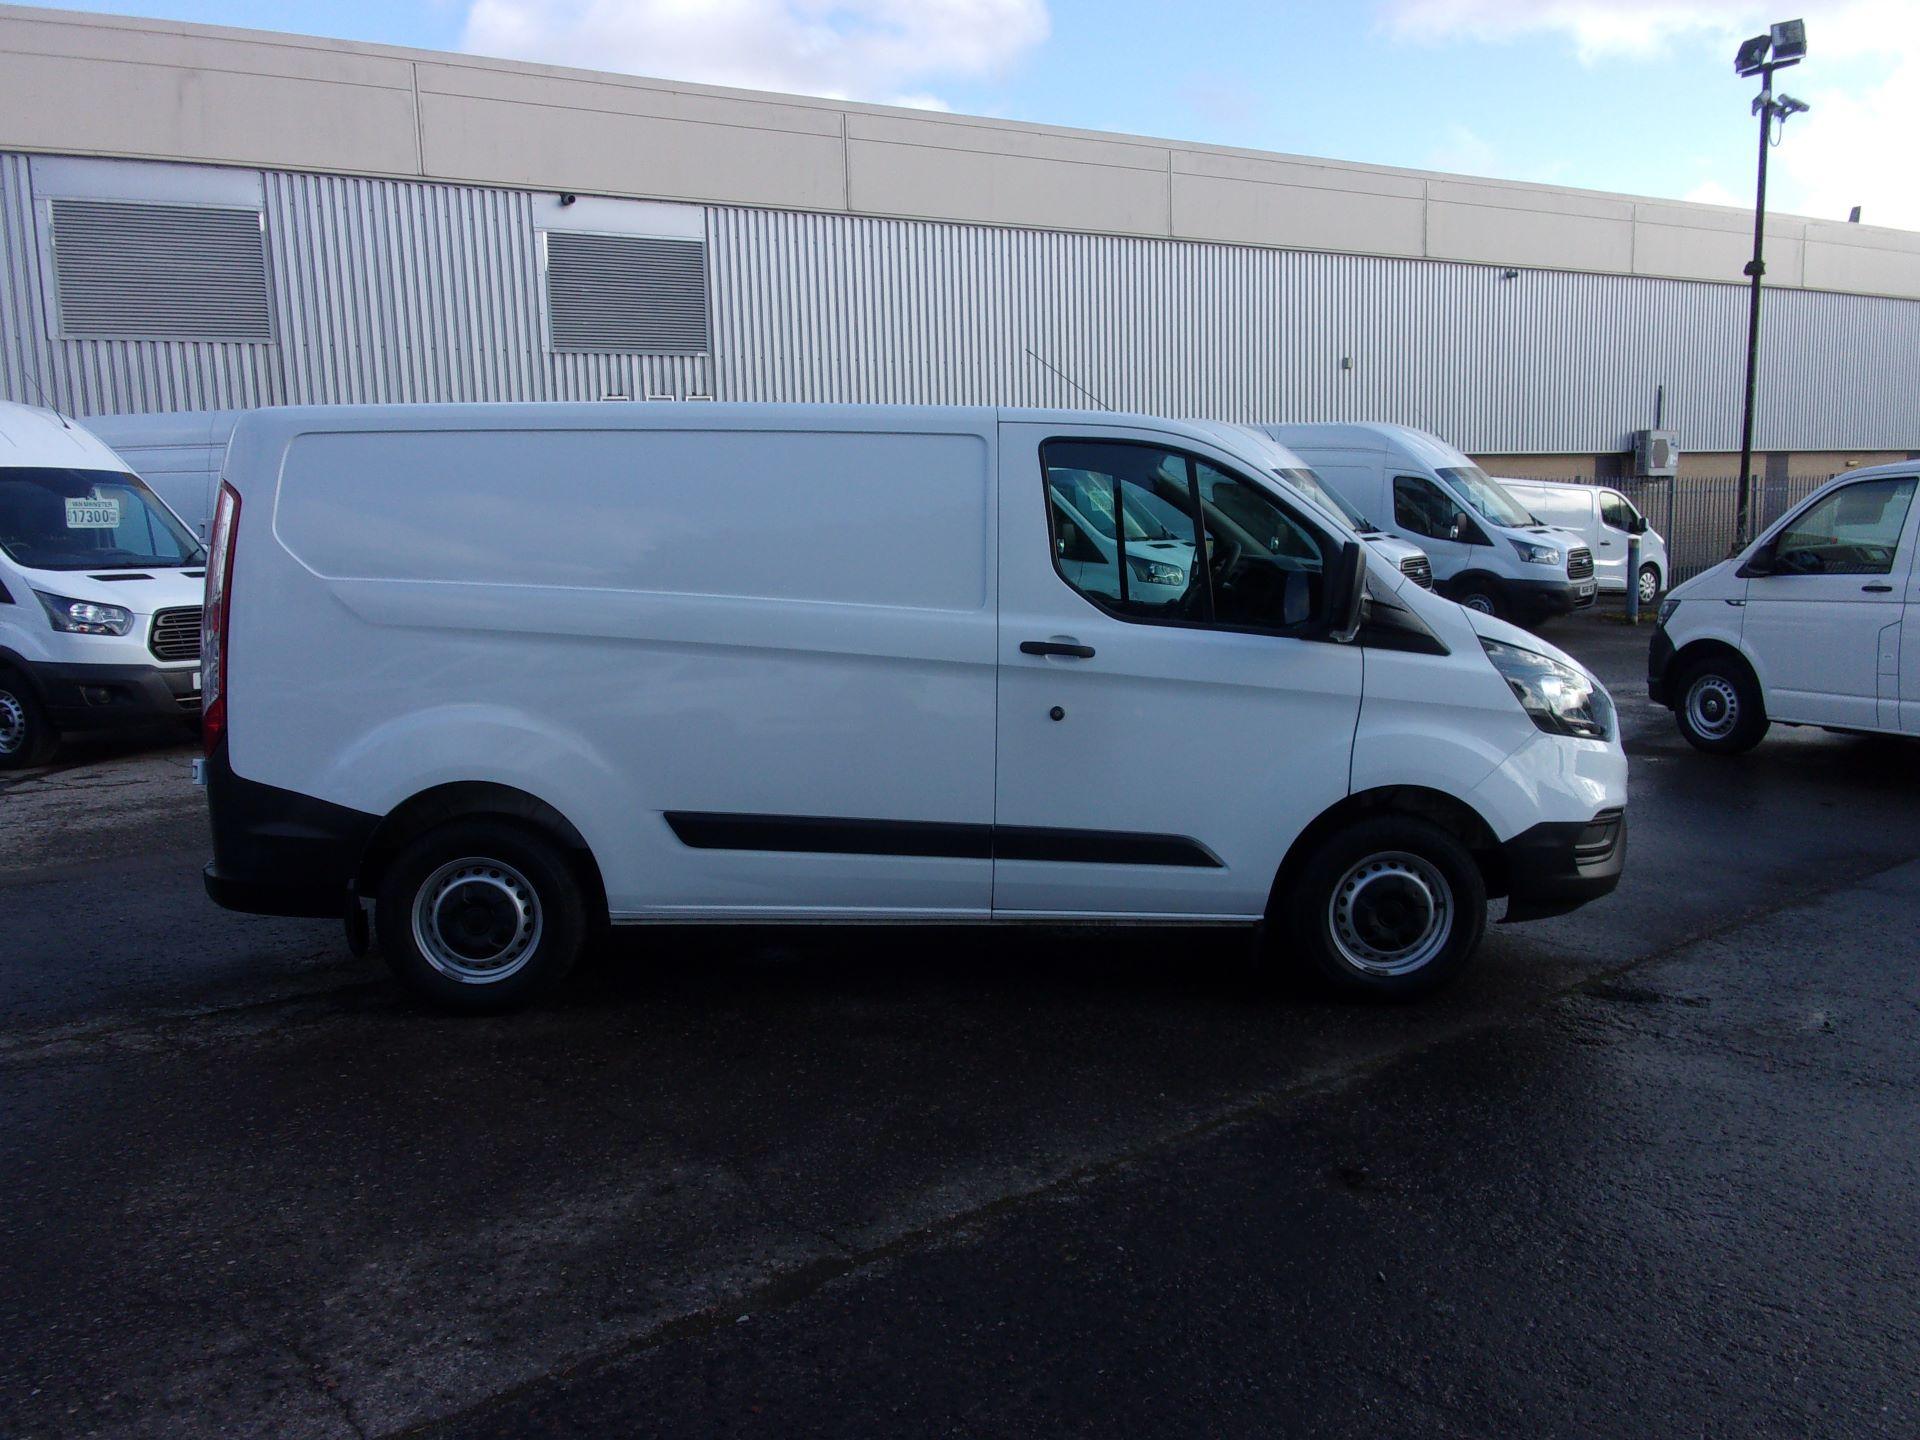 2018 Ford Transit Custom 300 L1 DIESEL FWD 2.0 TDCI 105PS LOW ROOF VAN EURO 6 (FD18VZC) Image 8